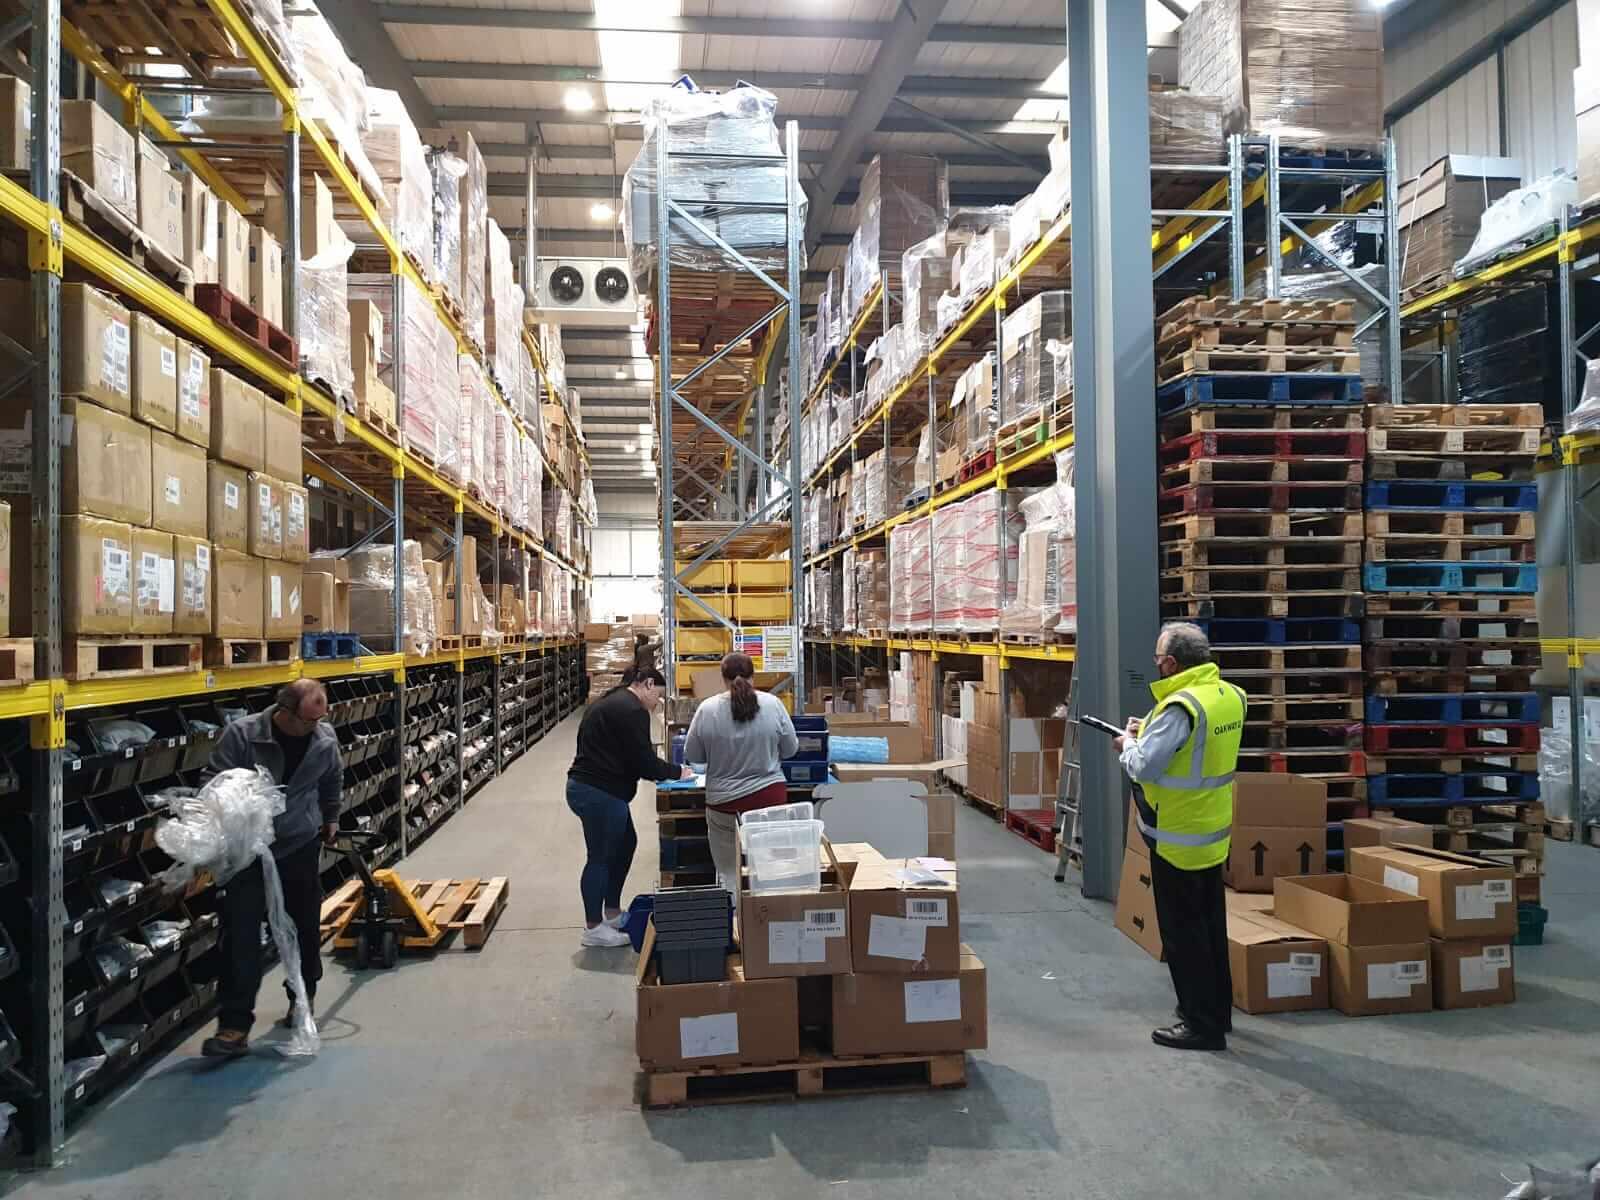 Warehouse survey